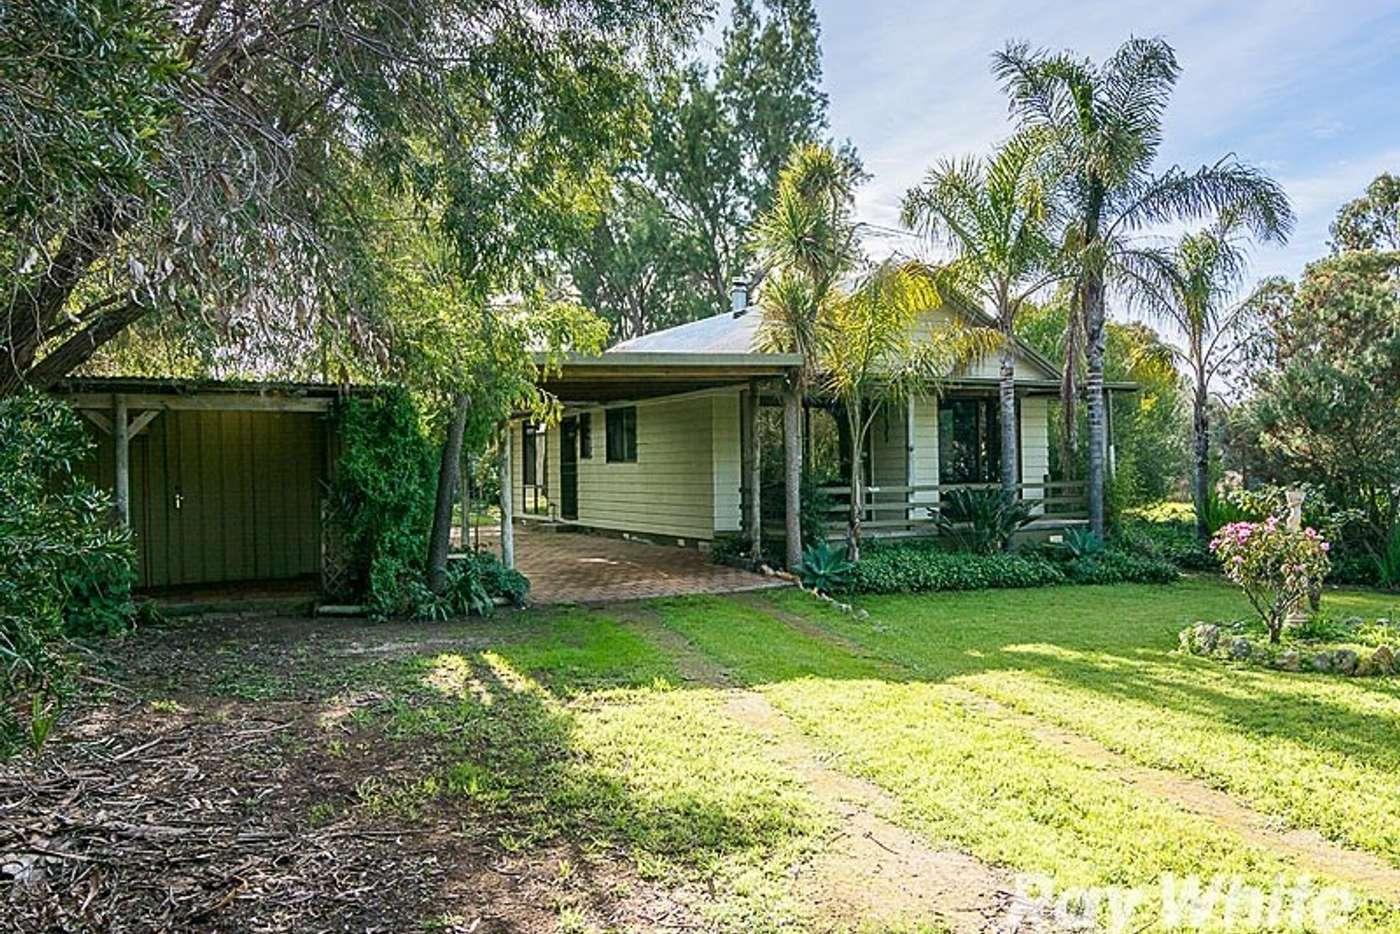 Main view of Homely house listing, 33 Grandview Drive, Clayton Bay SA 5256